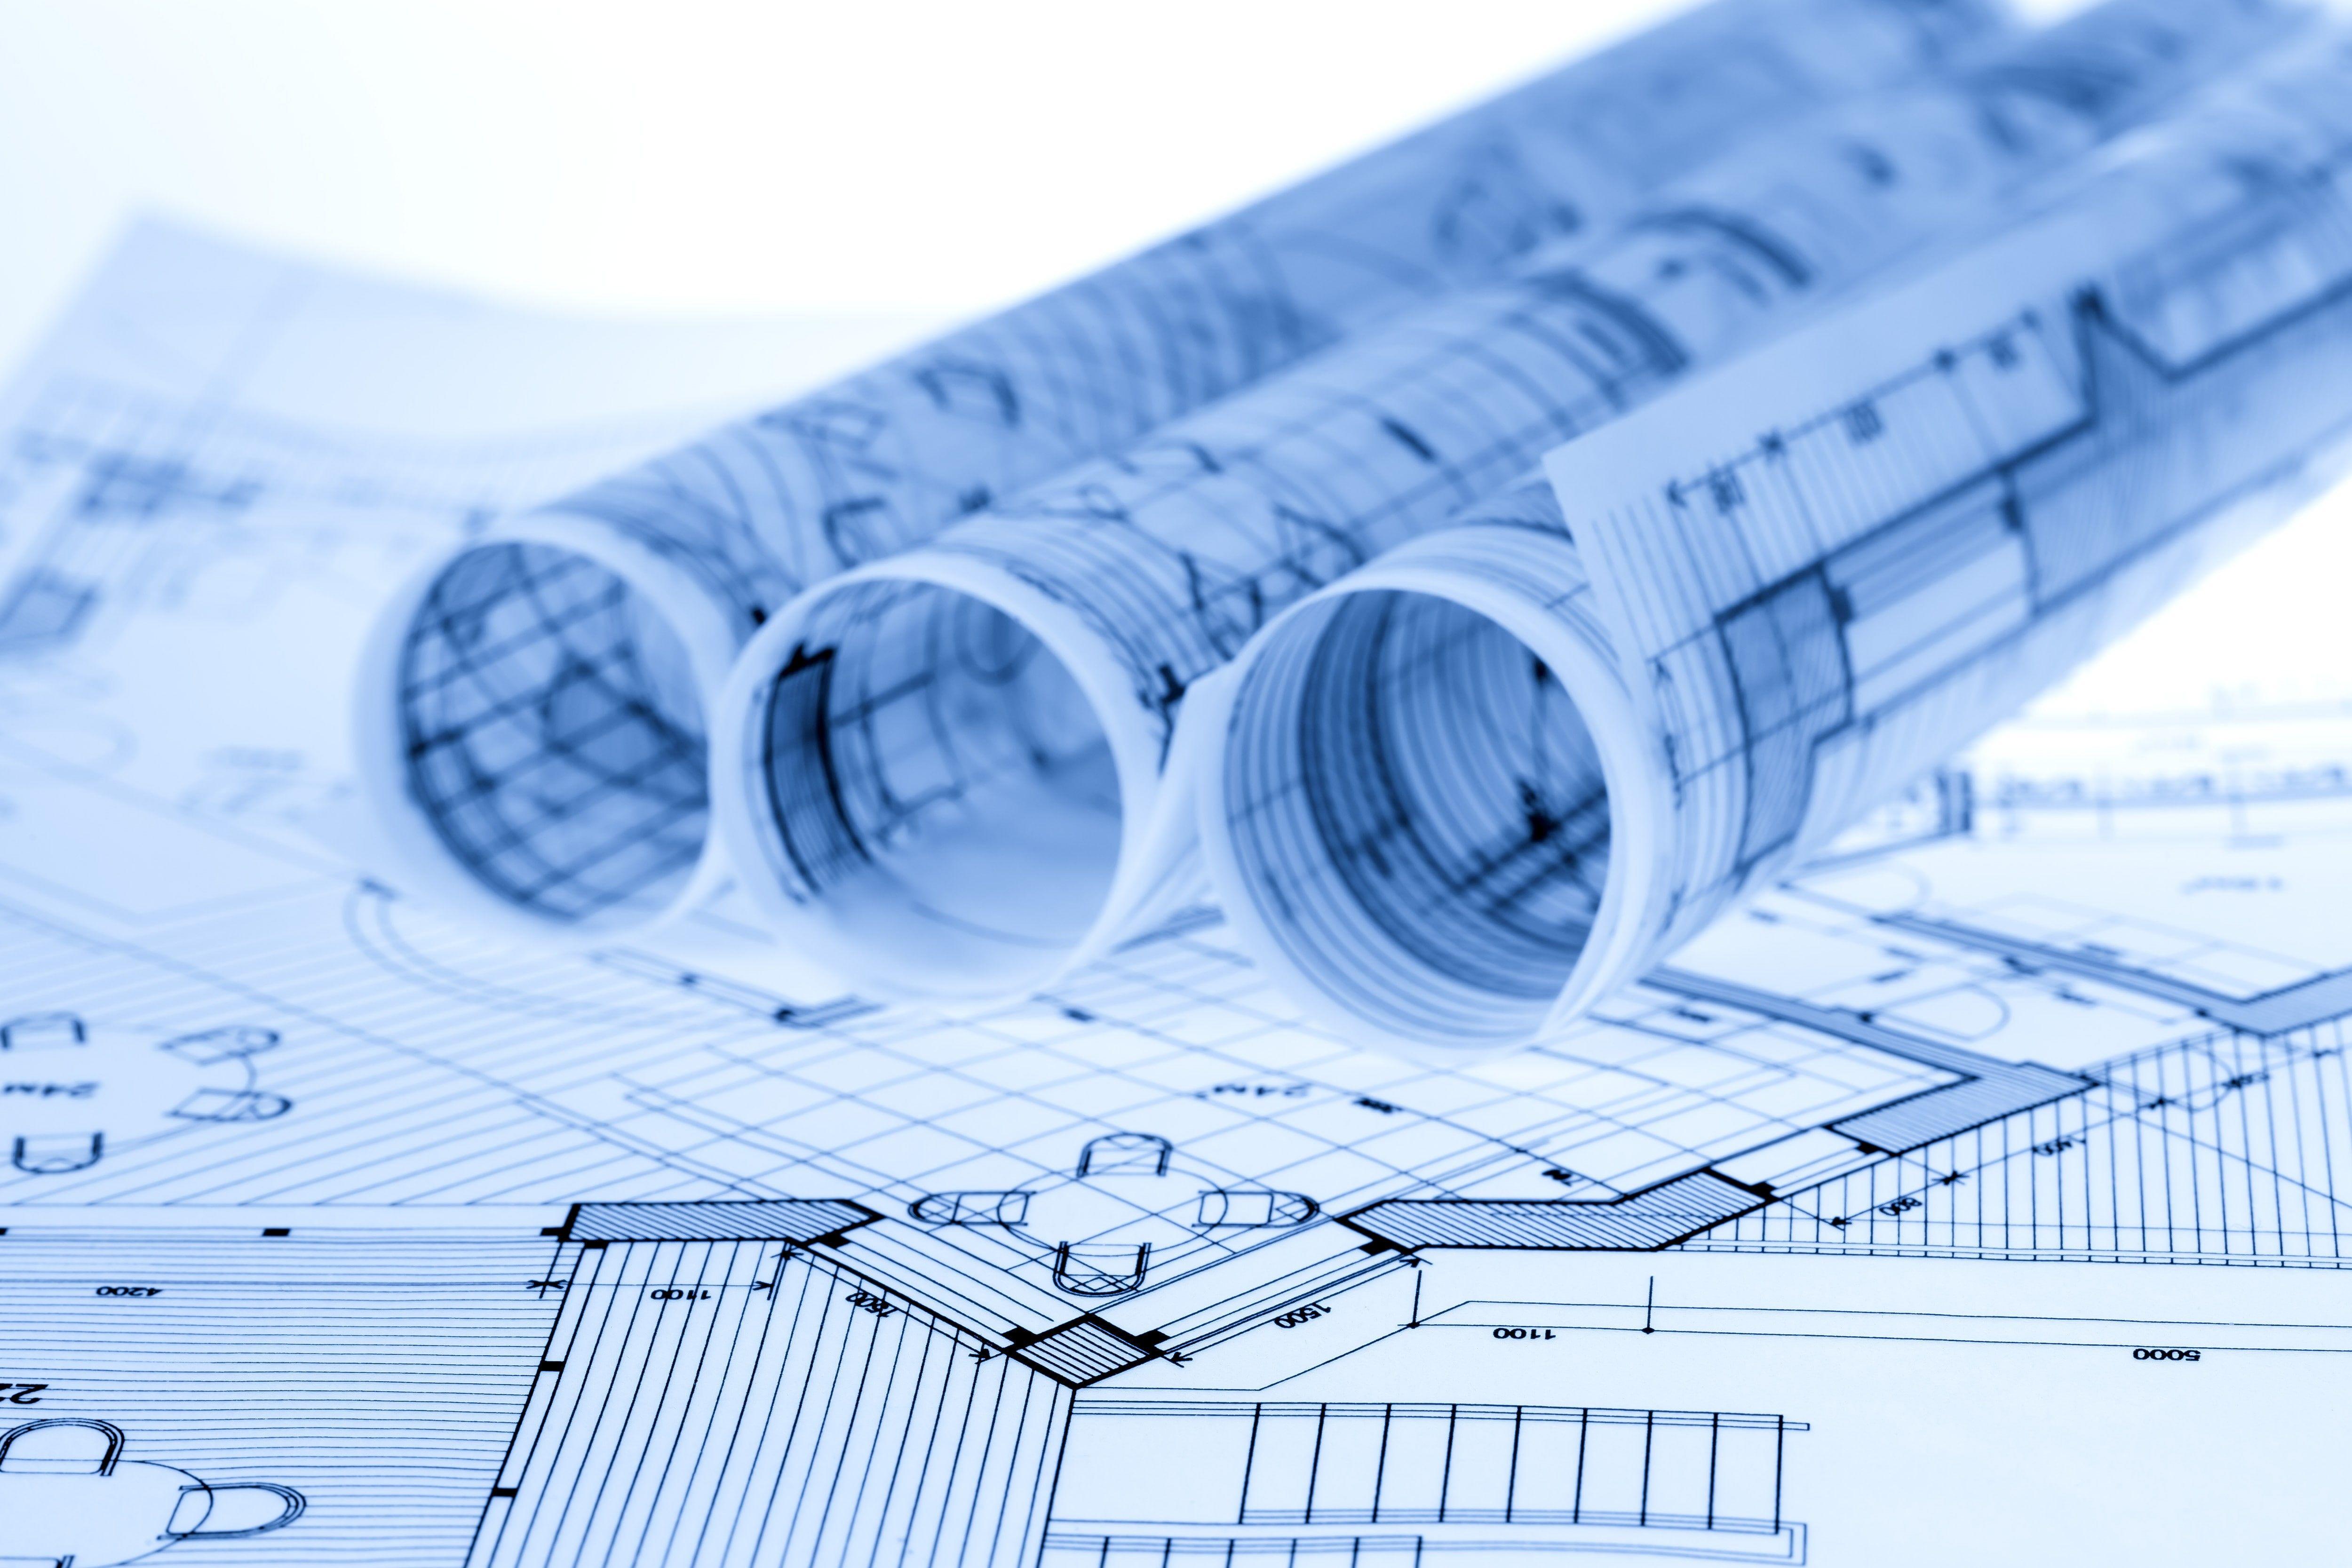 Scrolls Drawing Engineering Architecture 4k Wallpaper Hdwallpaper Desktop In 2021 Architecture Blueprints Architecture Blueprints